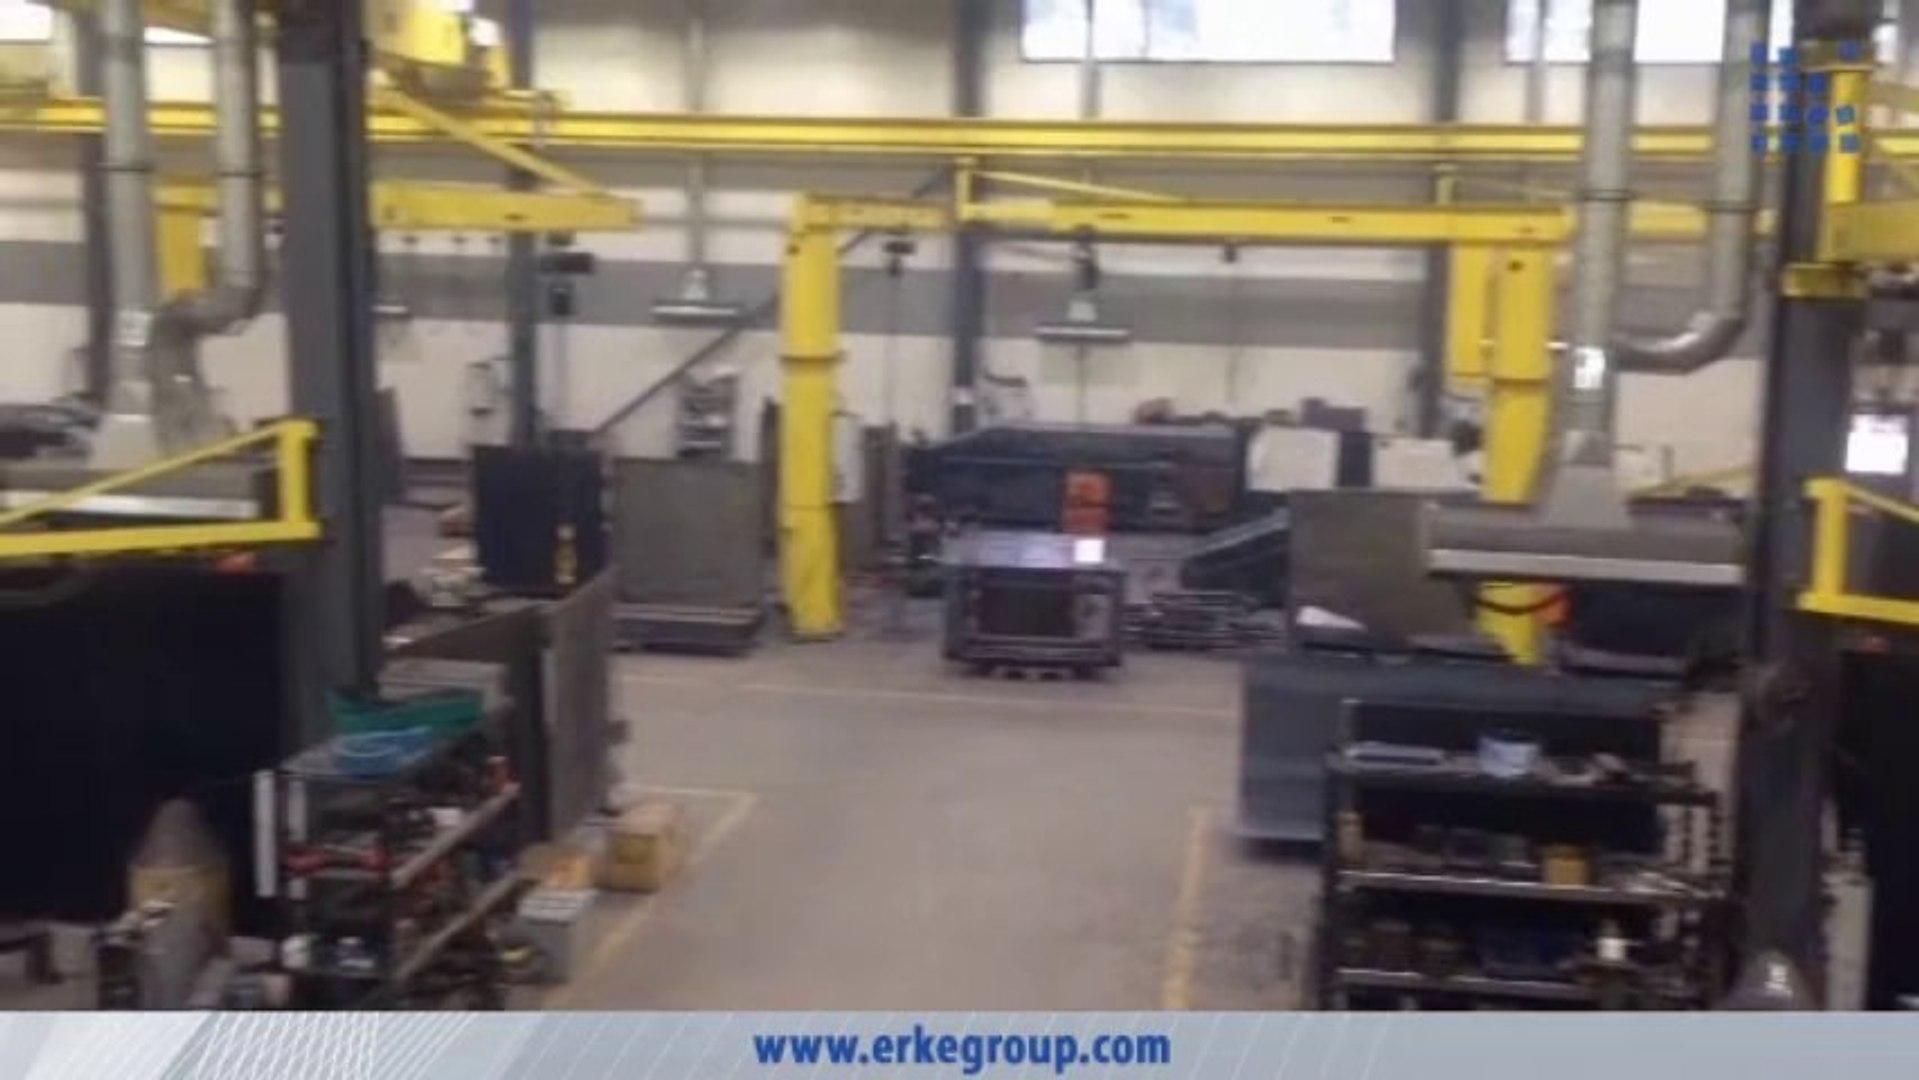 ERKE Dış Ticaret ltd., Big Float Amphibious Excavator - Factory - www.erkegroup.com